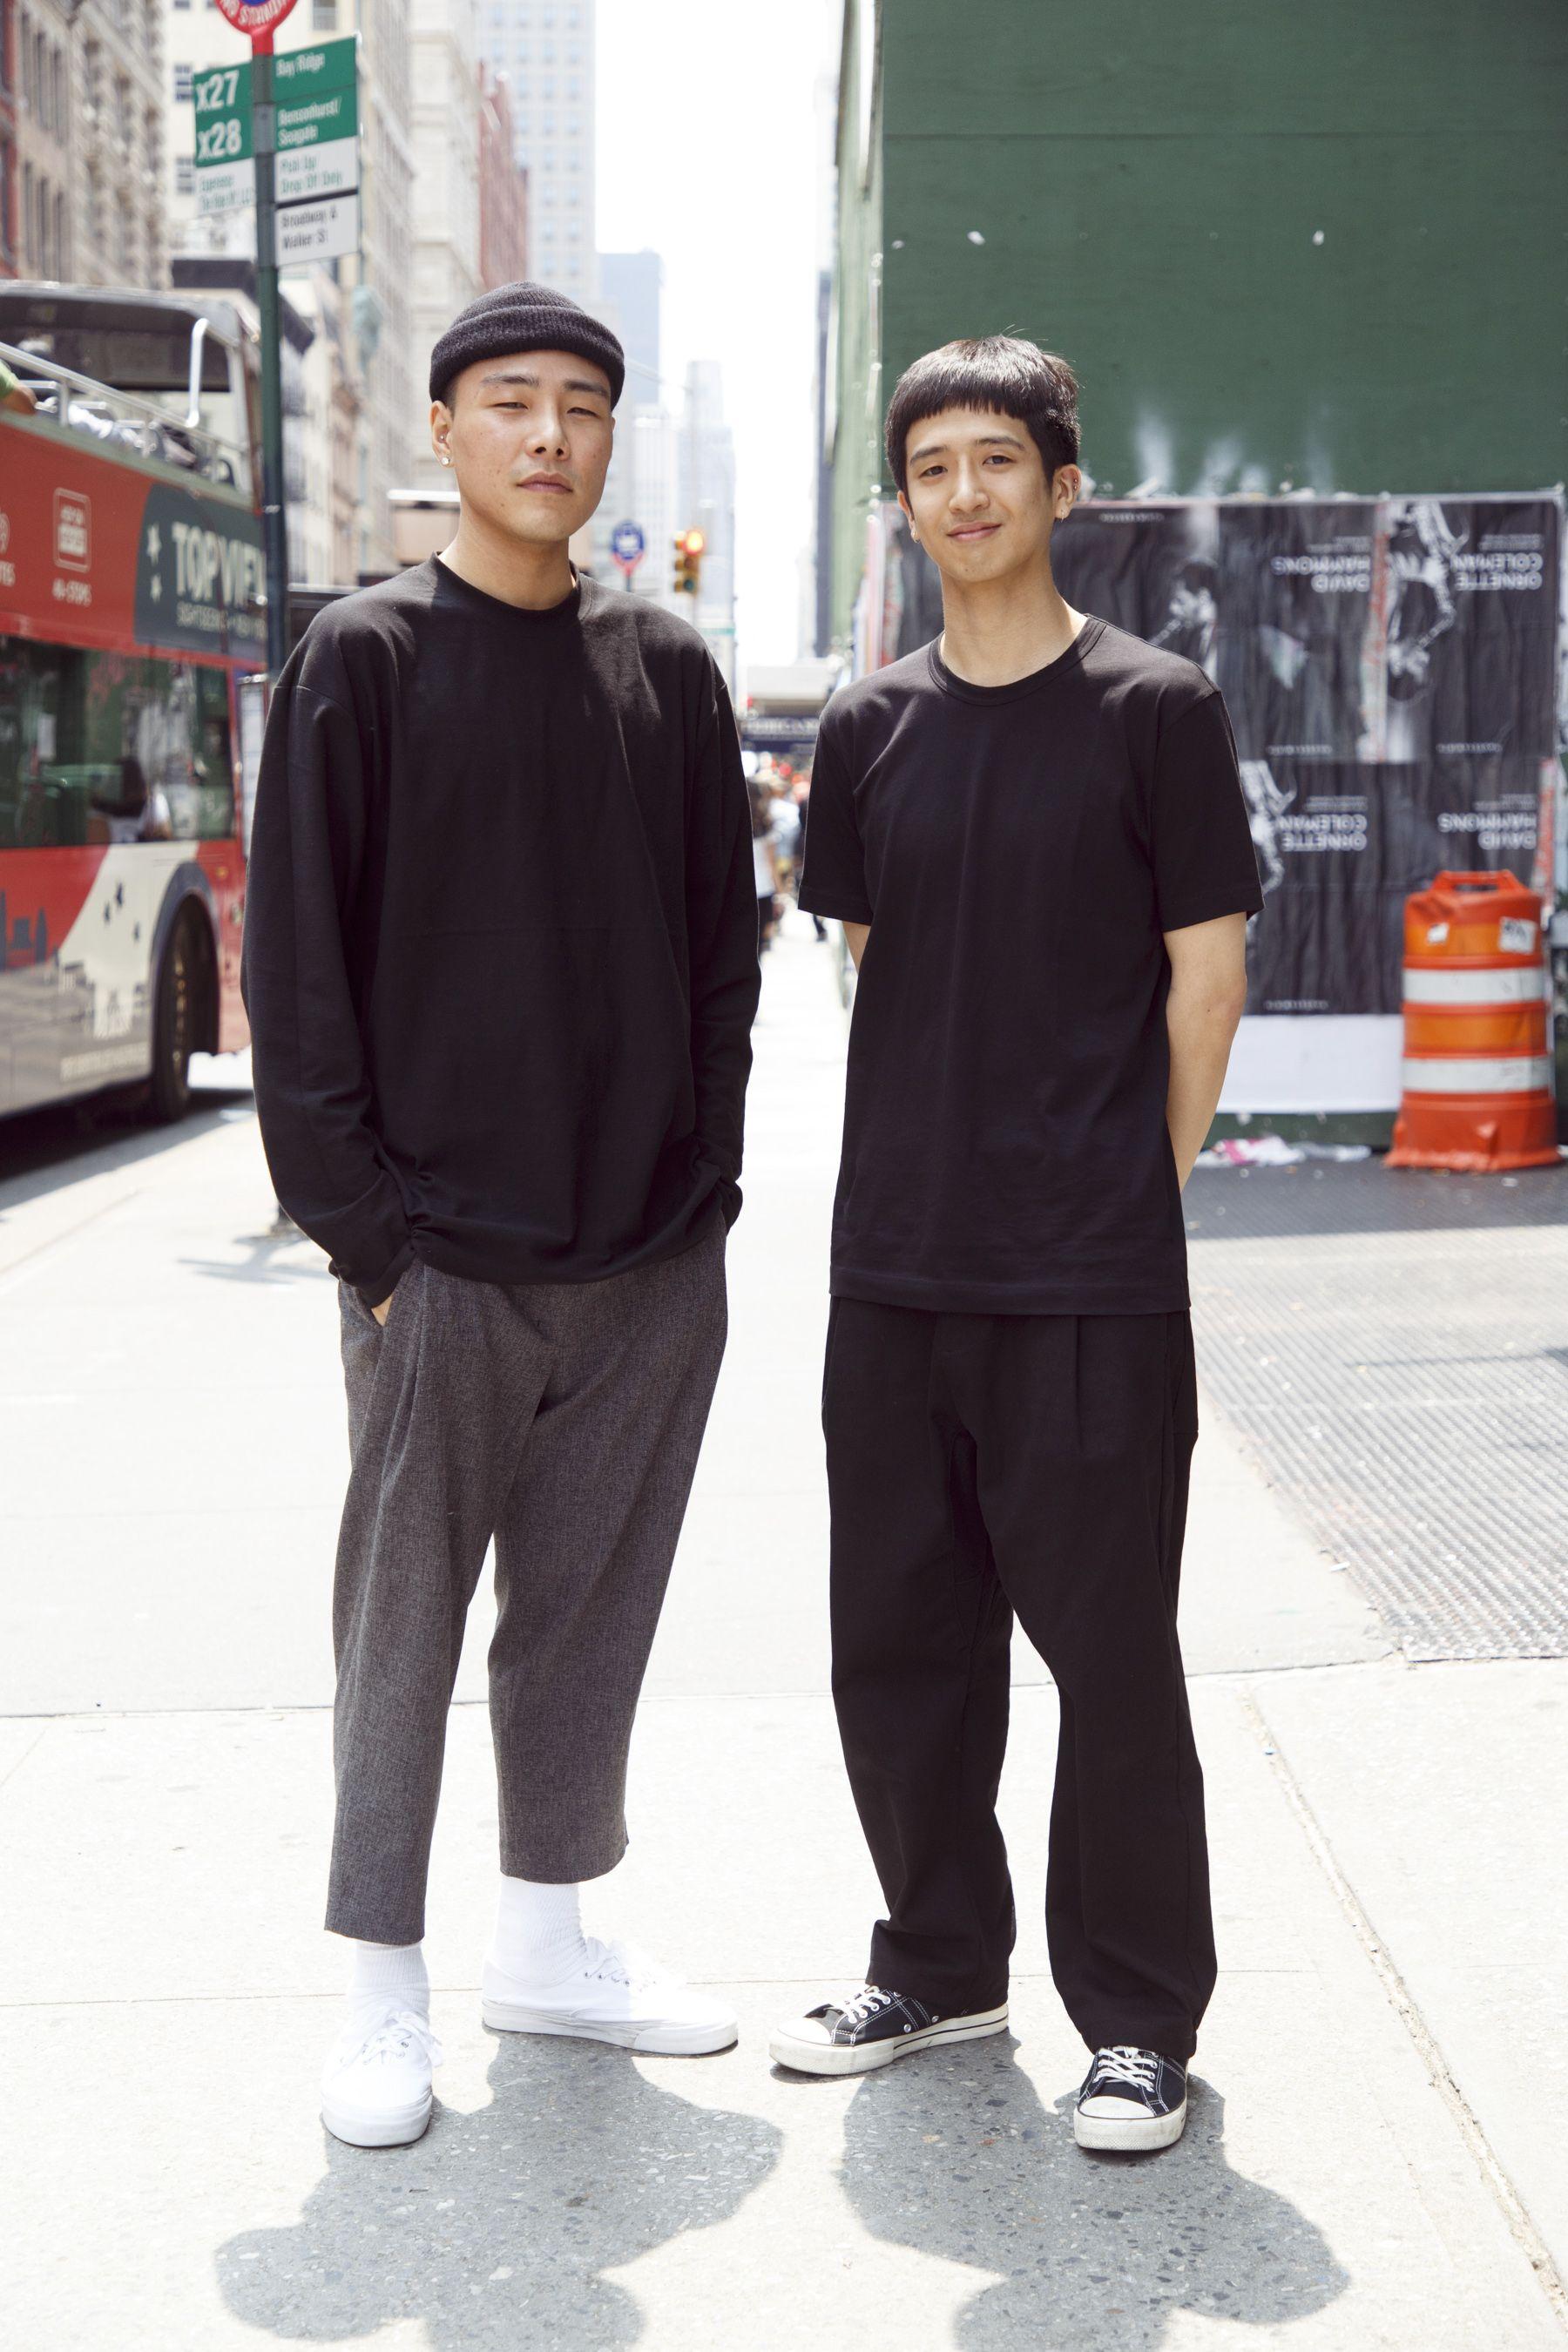 New York Men S Street Style Spring 2020 Day 3 The Impression In 2020 Mens Street Style Spring Mens Street Style New York Men S Street Style